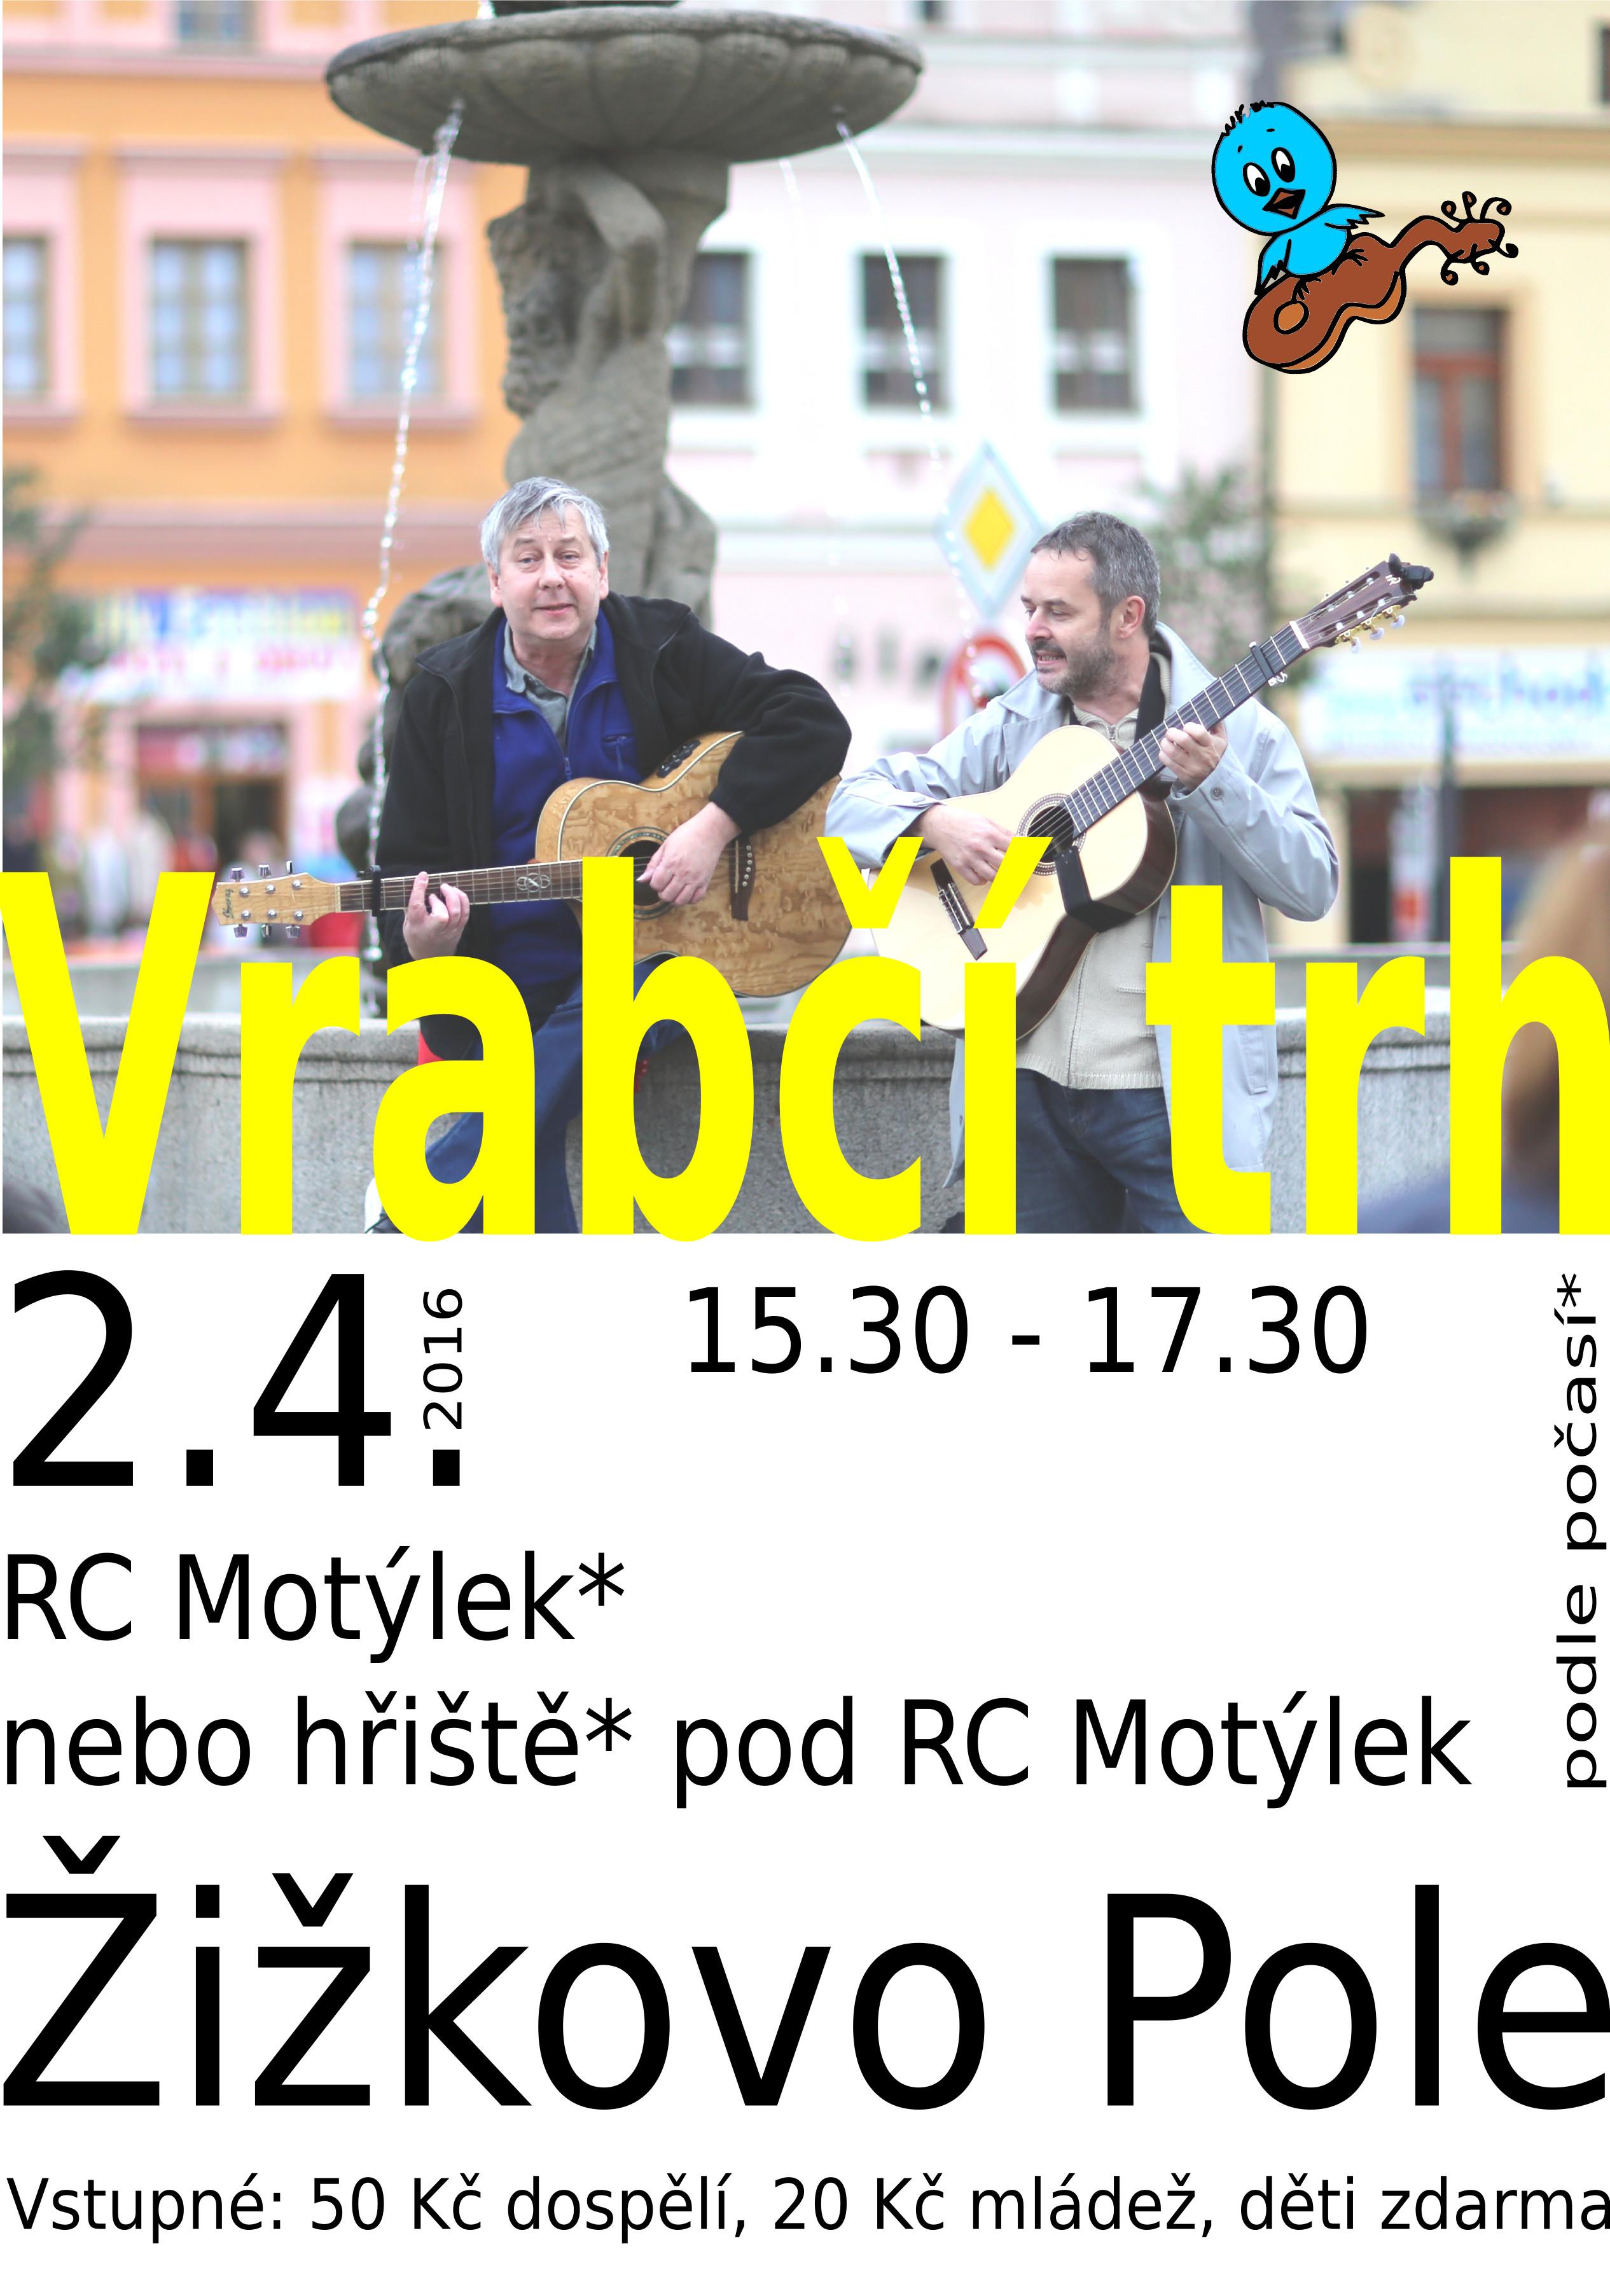 VT 2016 plakát Žižkovo Pole 140402